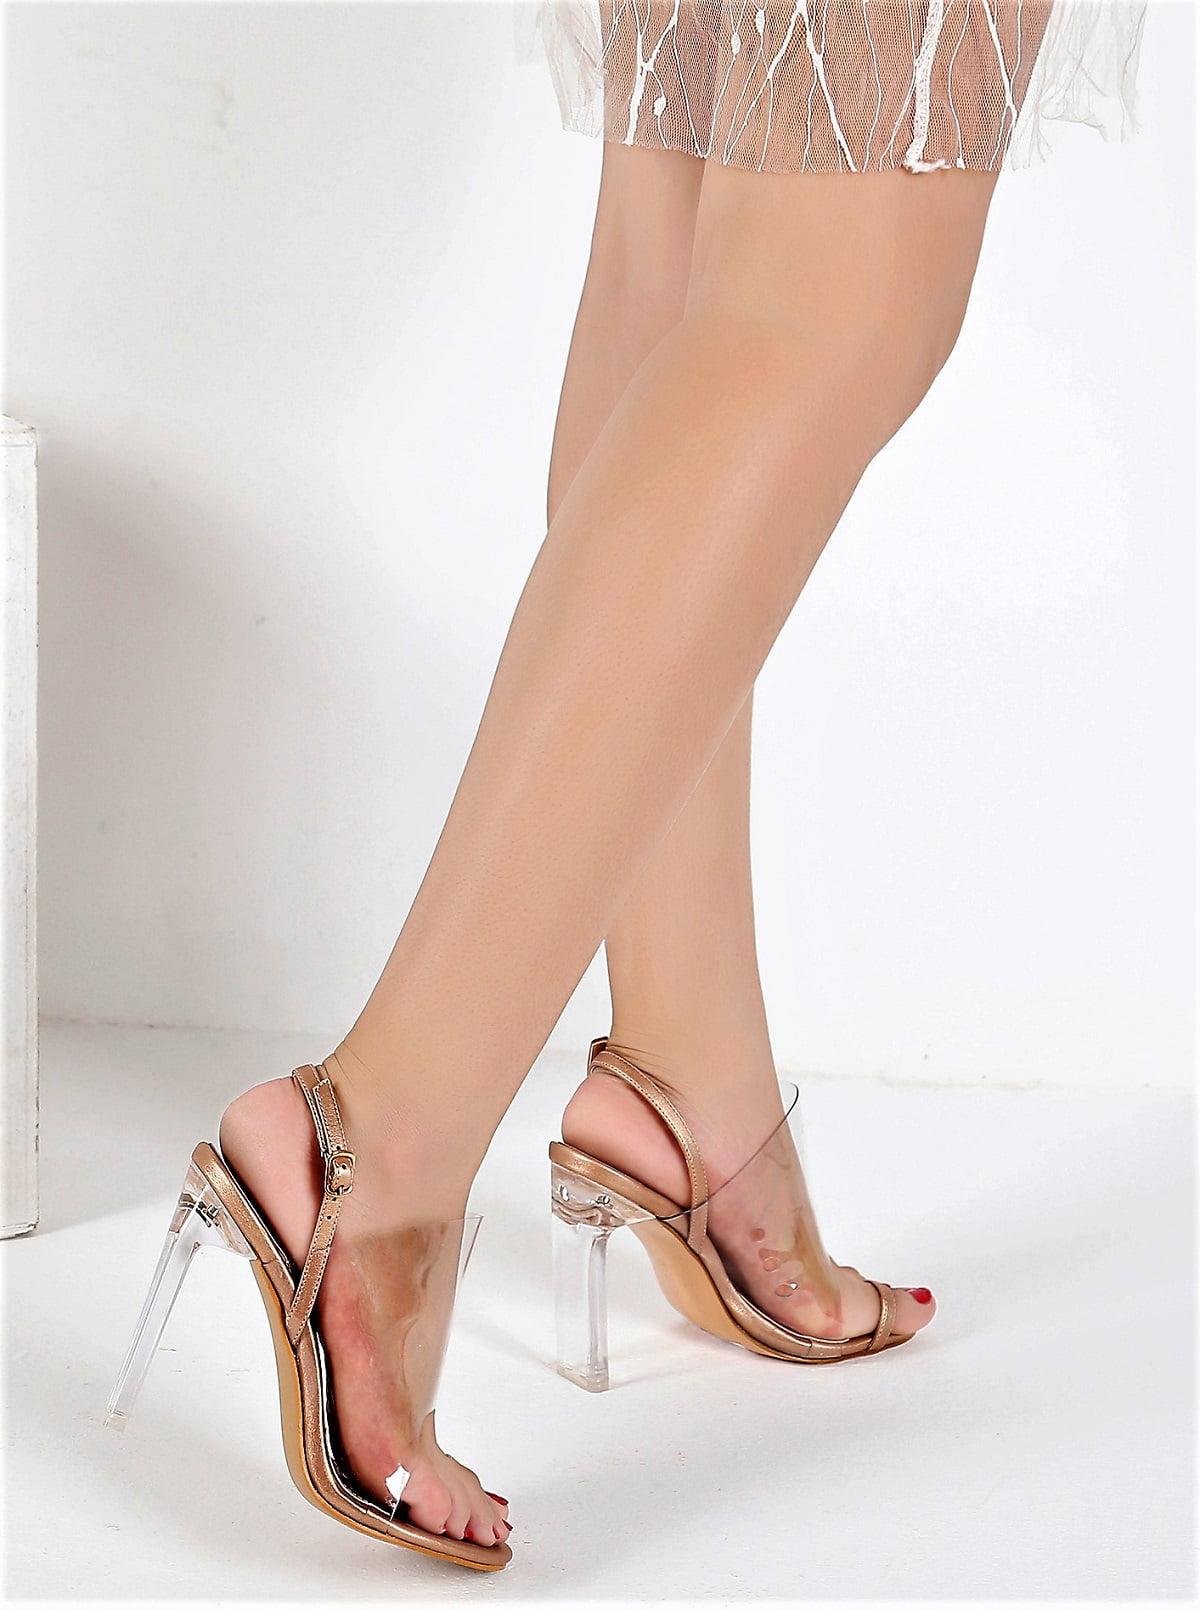 57a28cb4a705 Mackin J - 254-7 Womens Wedding Party Bridal Transparent PVC Slingback Slip  On Mules Sandals Lucite Heels Rose Gold - Walmart.com